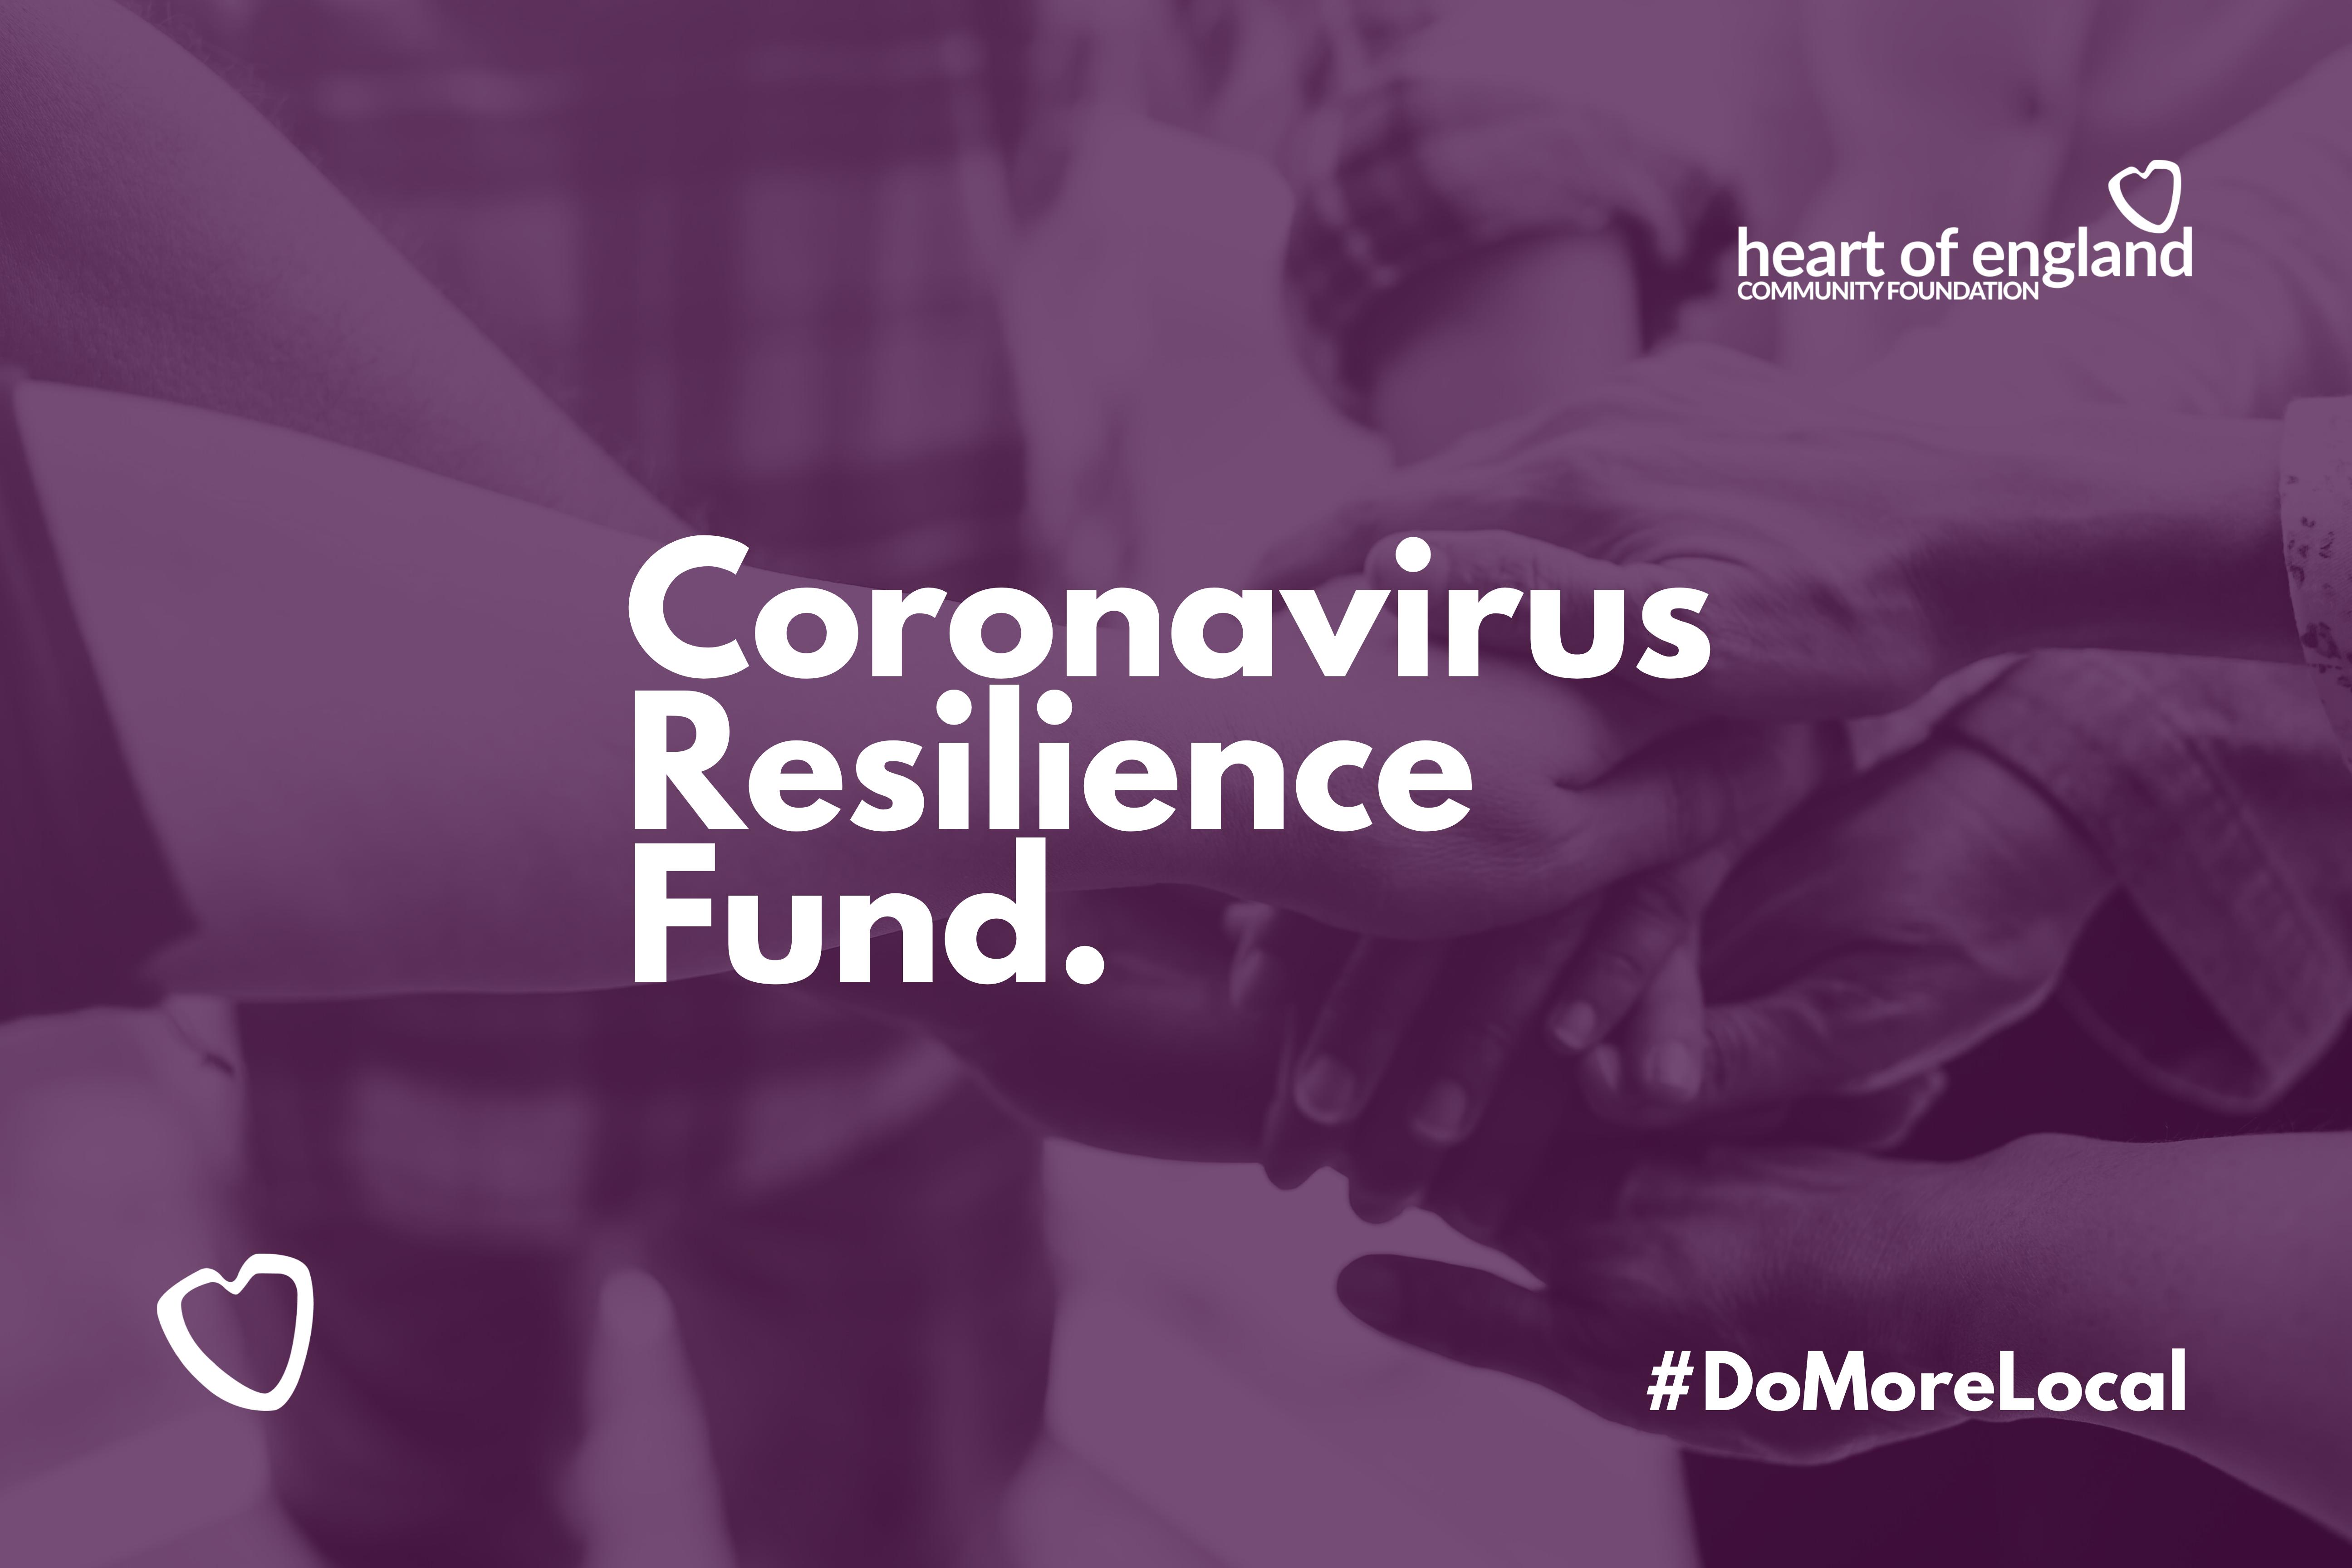 Coronavirus Resilience Appeal